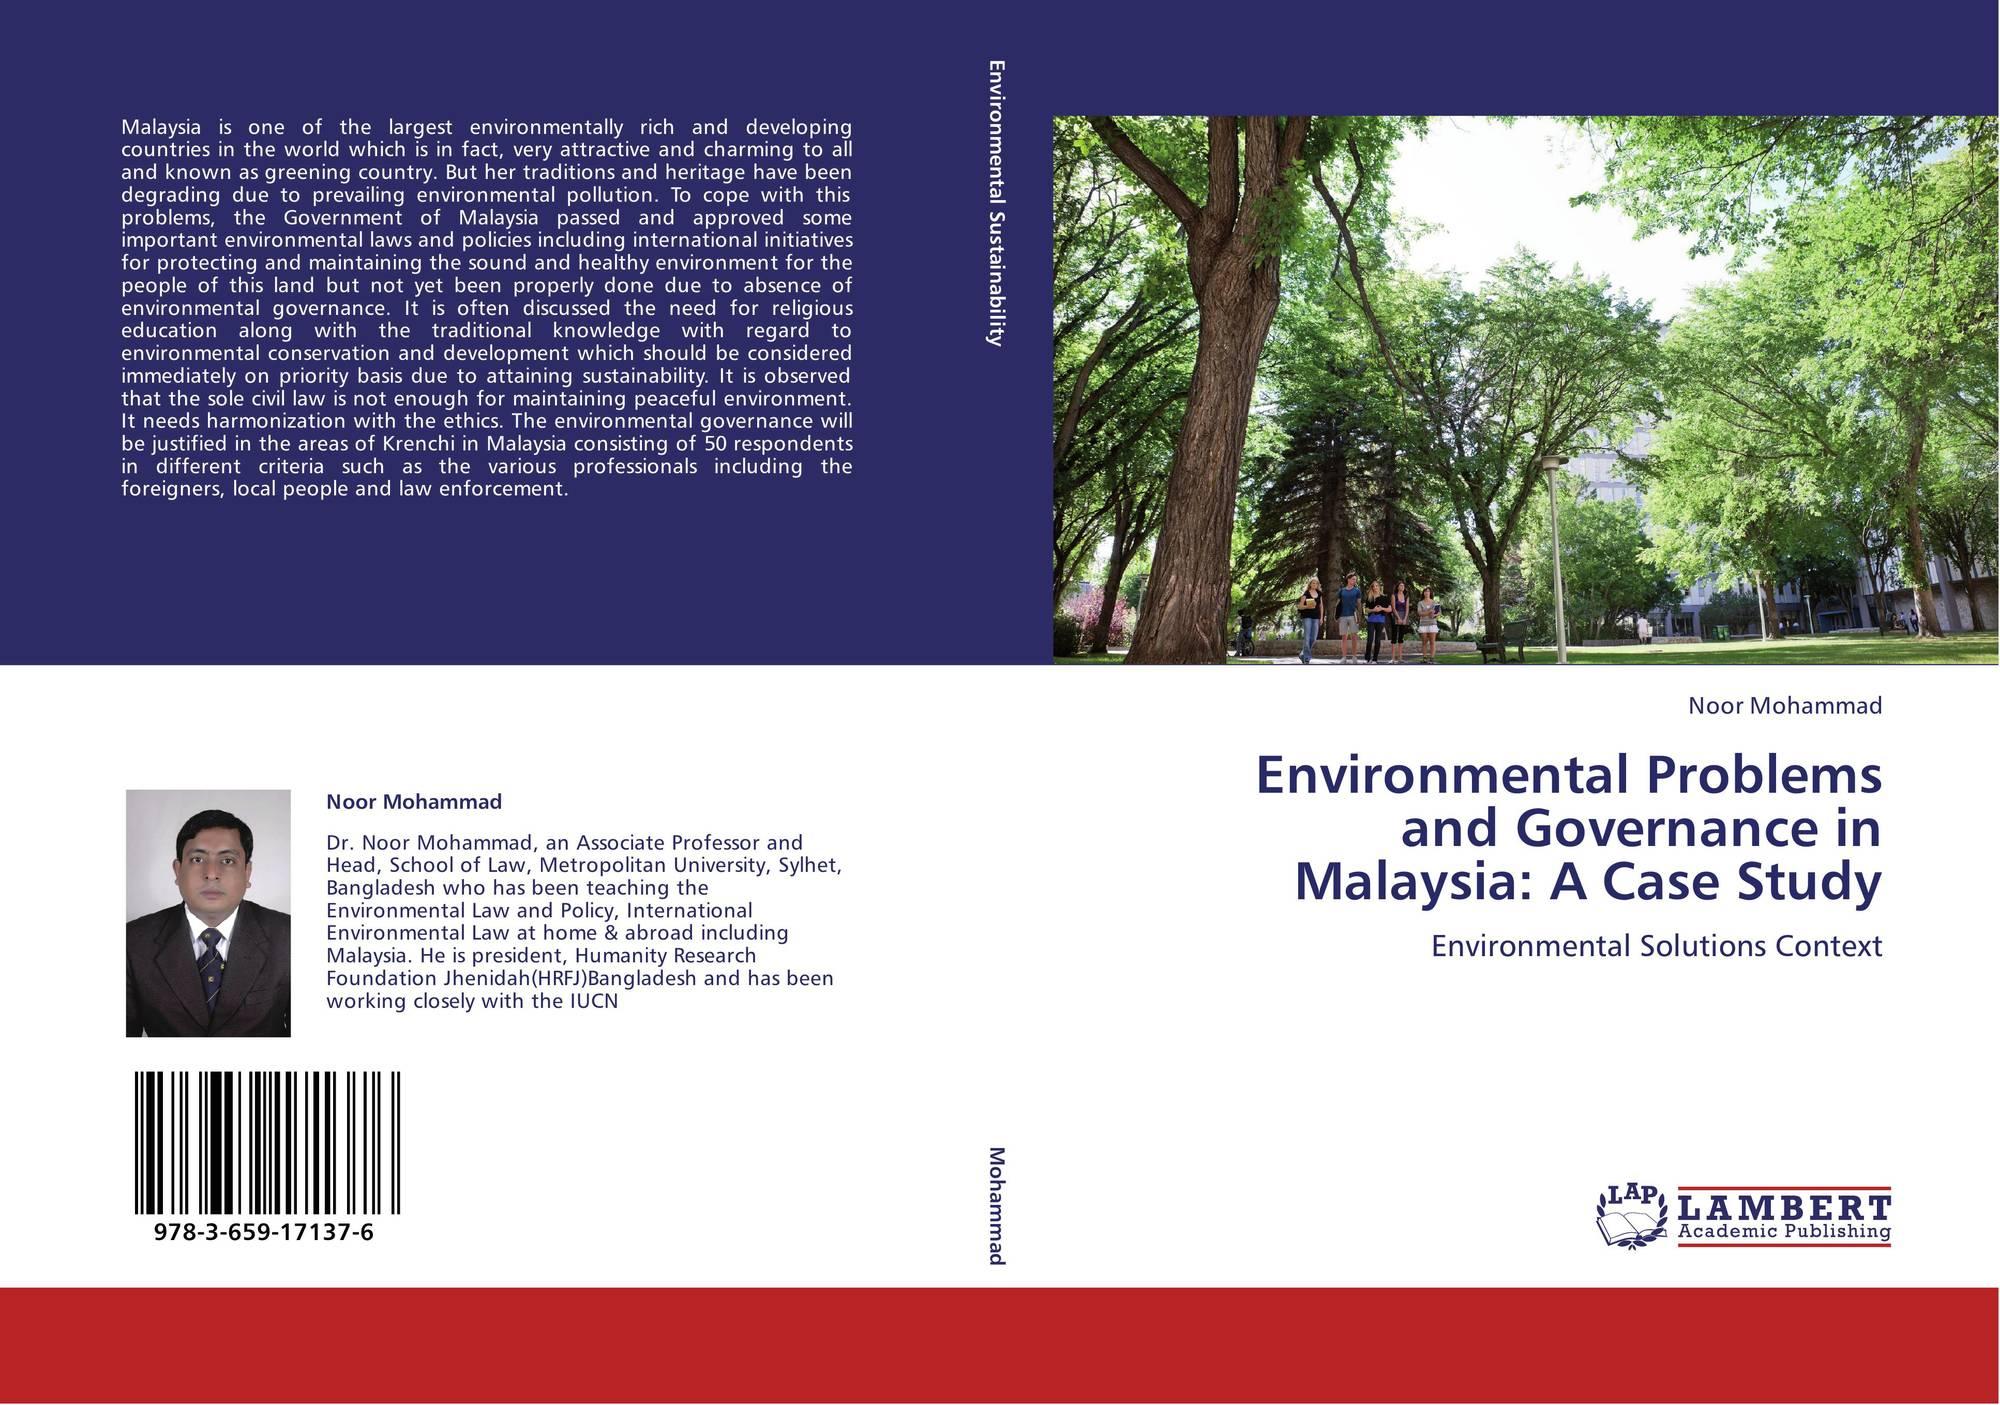 media ethics case studies in malaysia